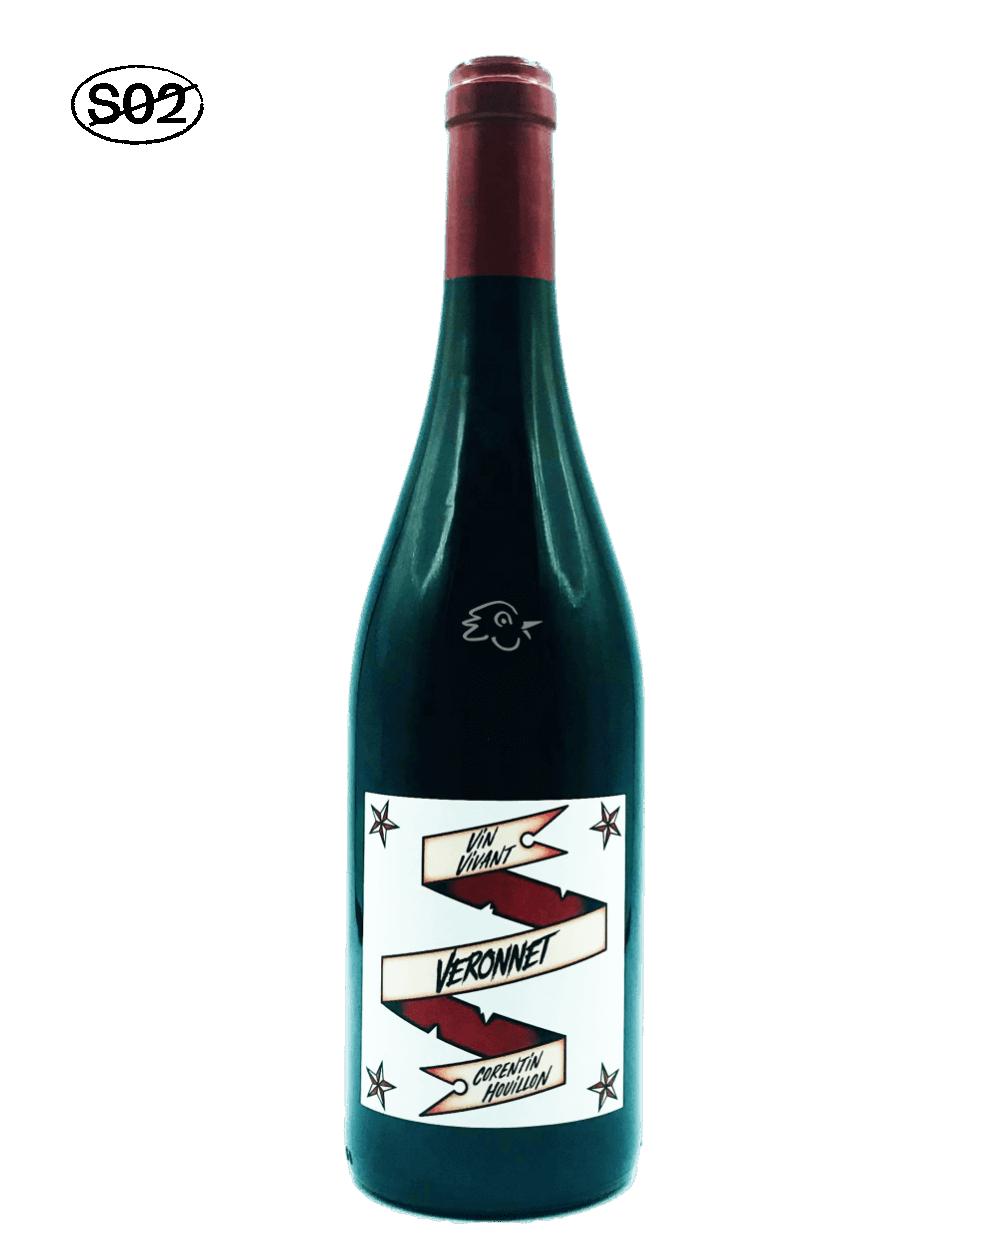 Corentin Houillon - Veronnet Rouge 2020 - Avintures